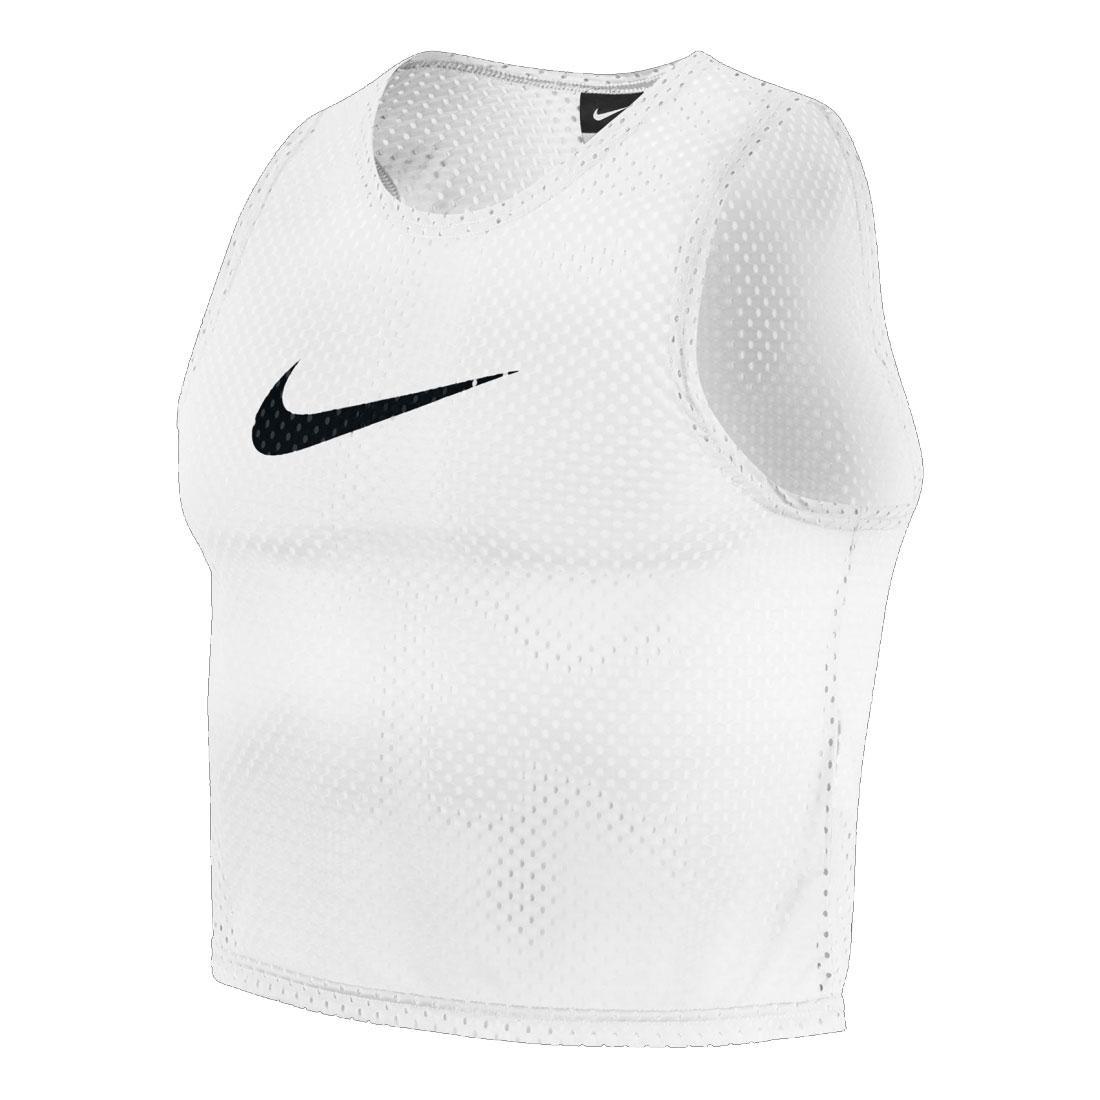 Манишка Nike Training Bib 910936-100 (Оригинал)